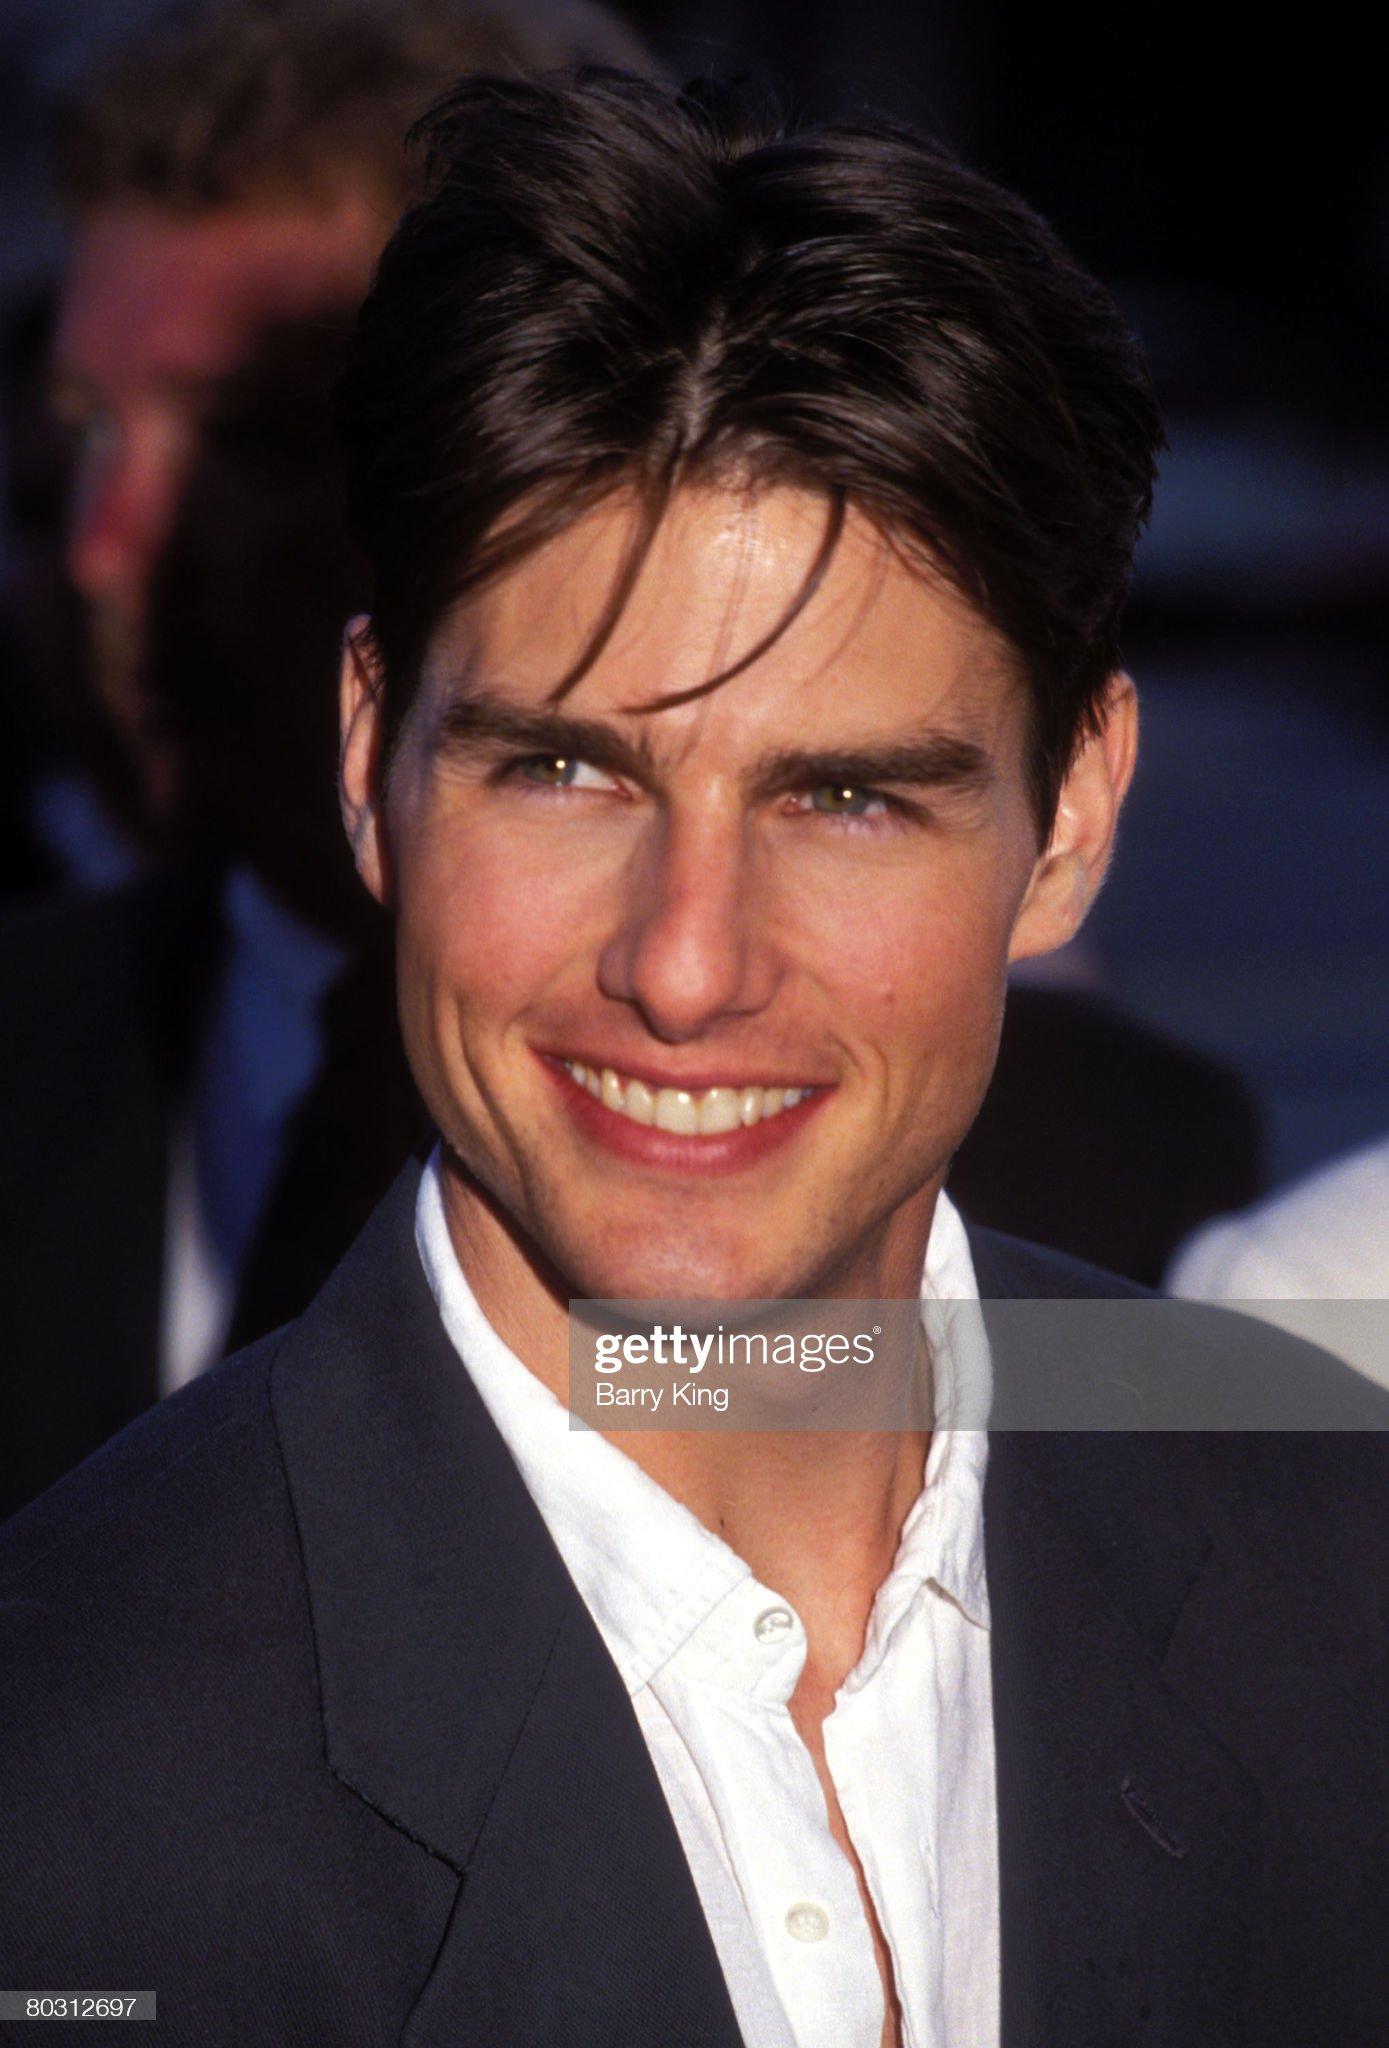 Tom Cruise (Galería de fotos) Tom-cruise-picture-id80312697?s=2048x2048